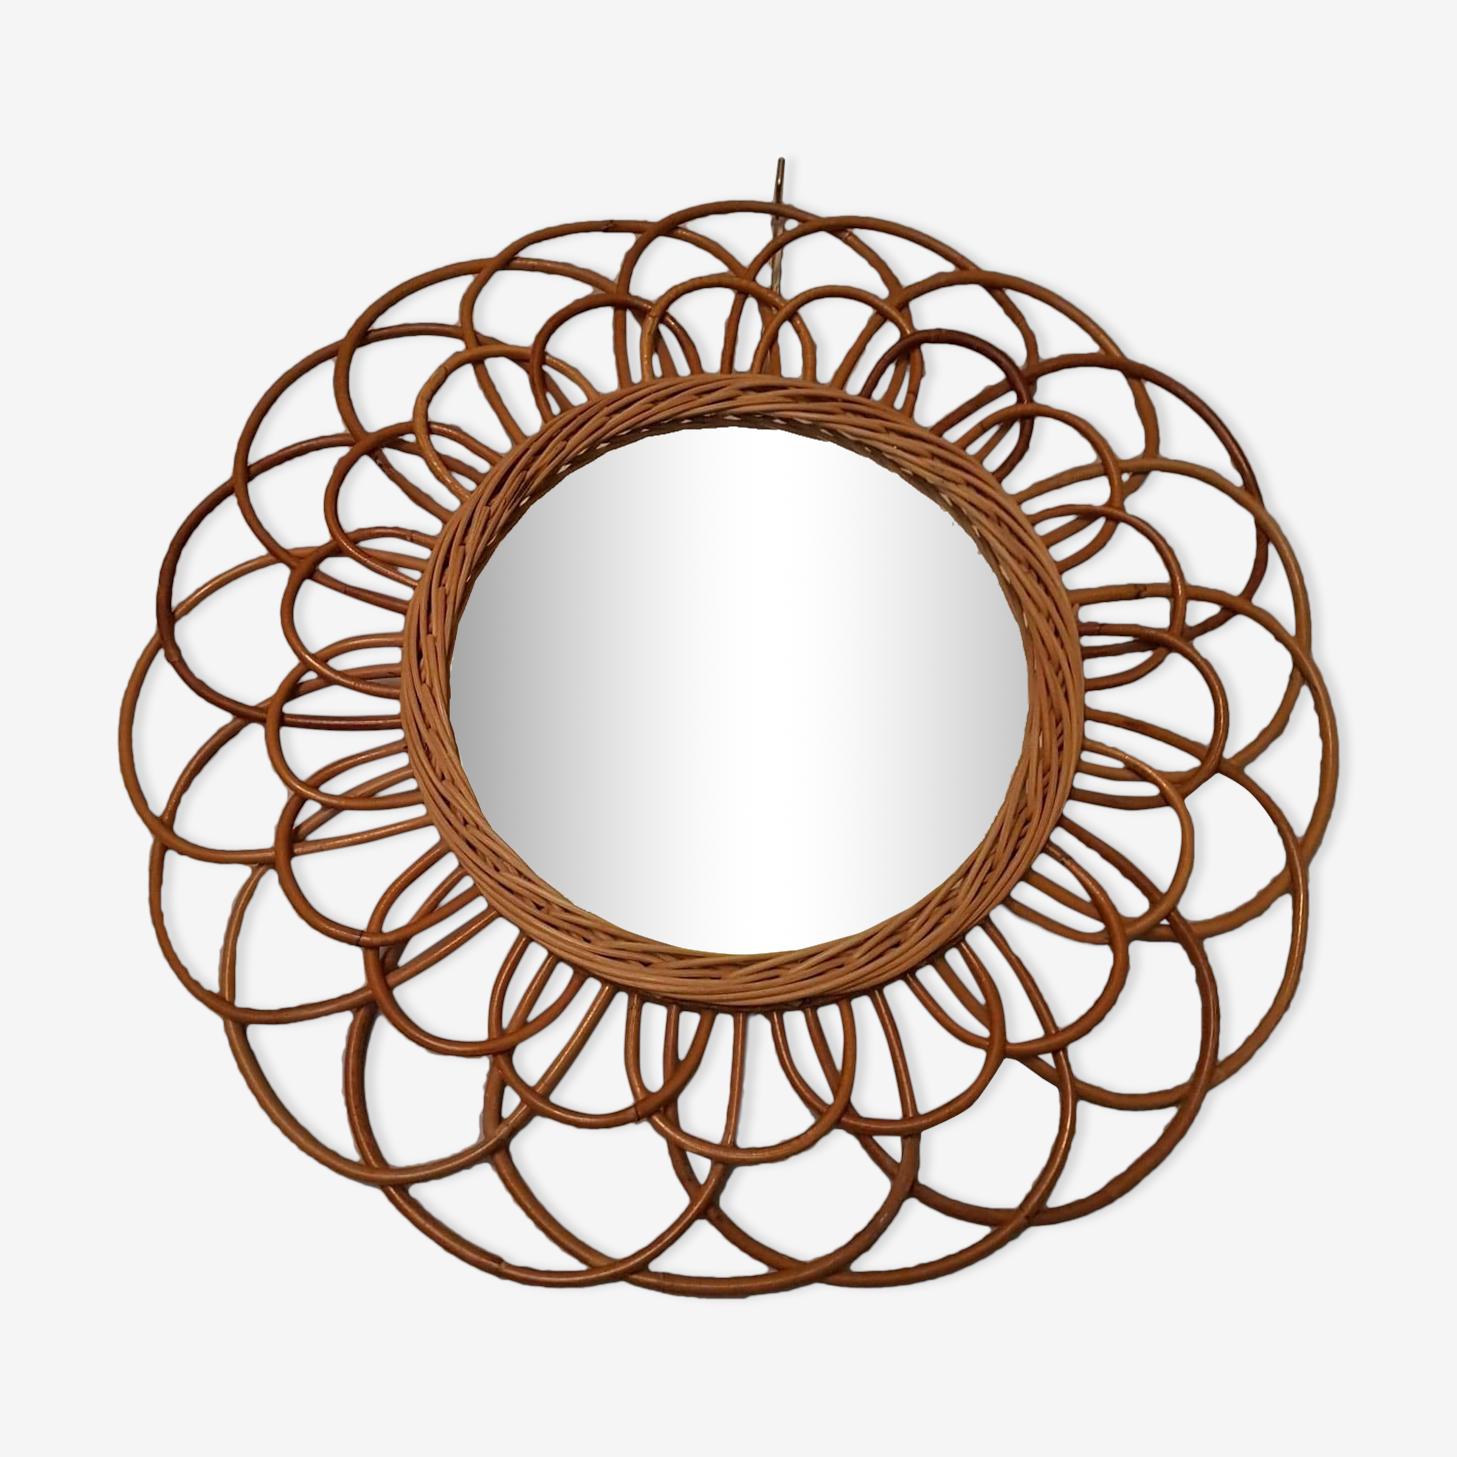 Mirror rattan vintage sun-shaped flower 5cm